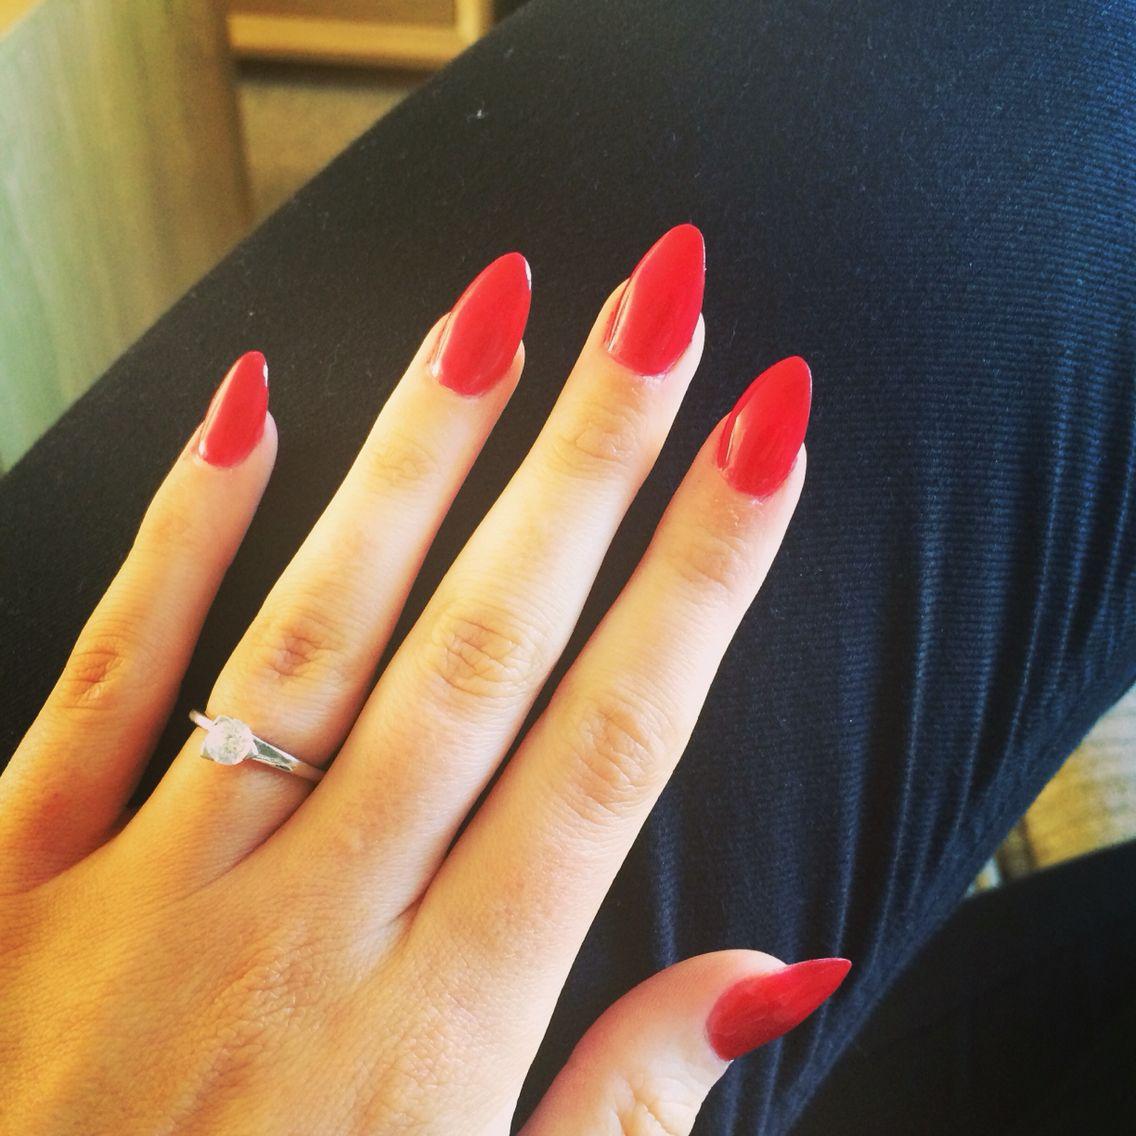 Red Almond Nails | Nails, nails...more nails! | Pinterest ...